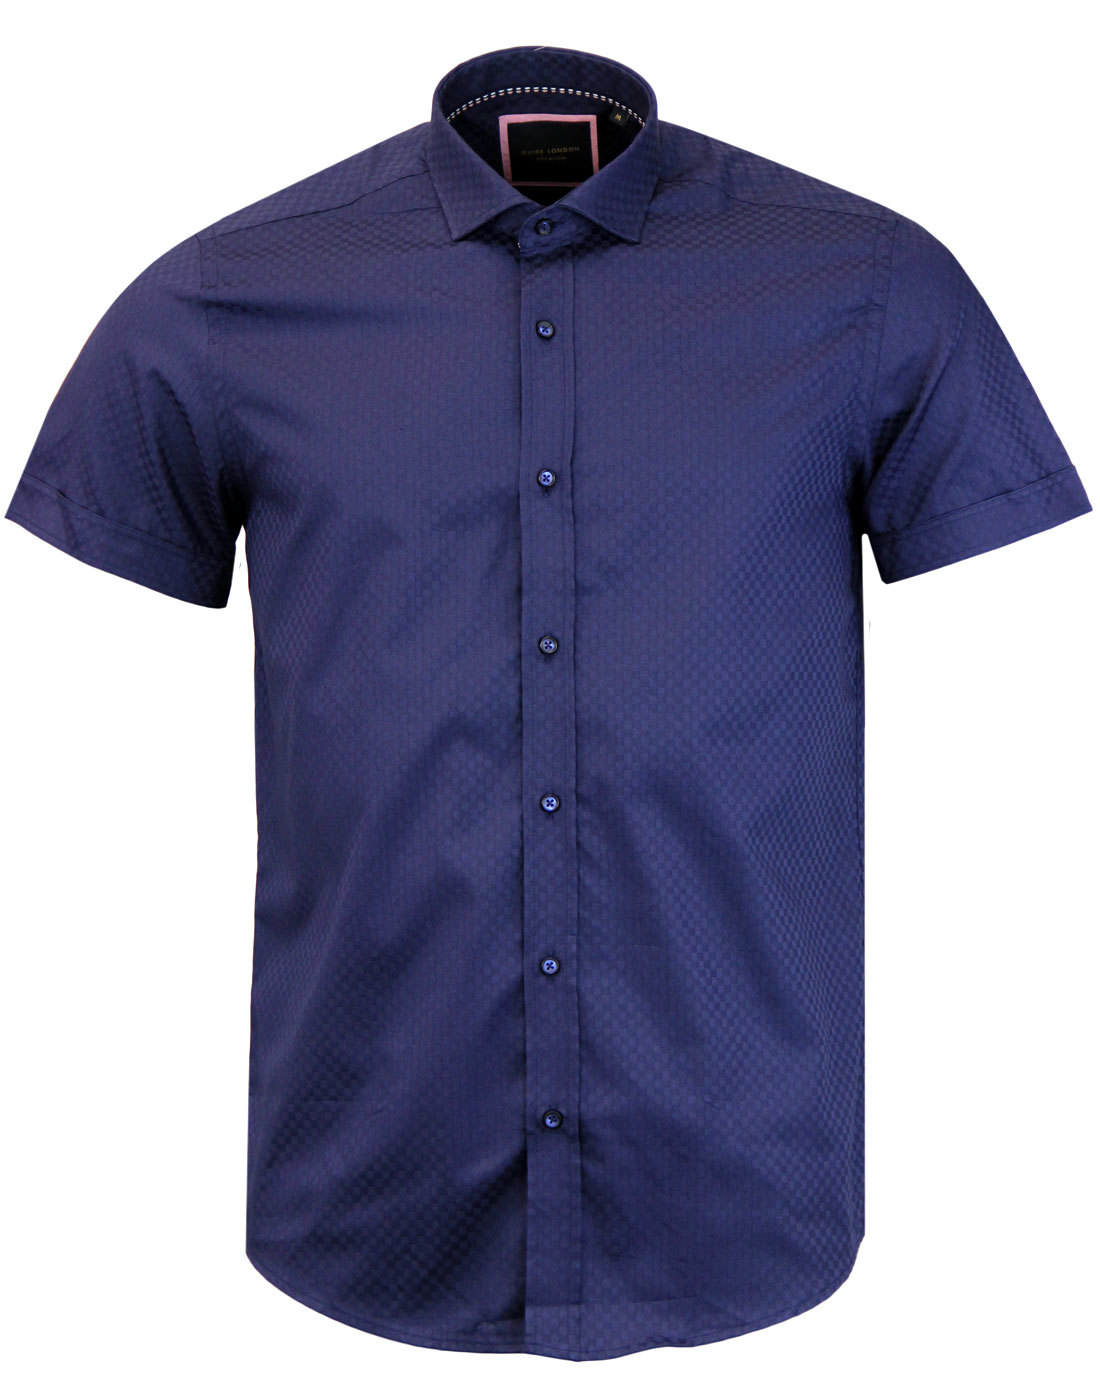 GUIDE LONDON Retro Mod Tonal Checkerboard Shirt